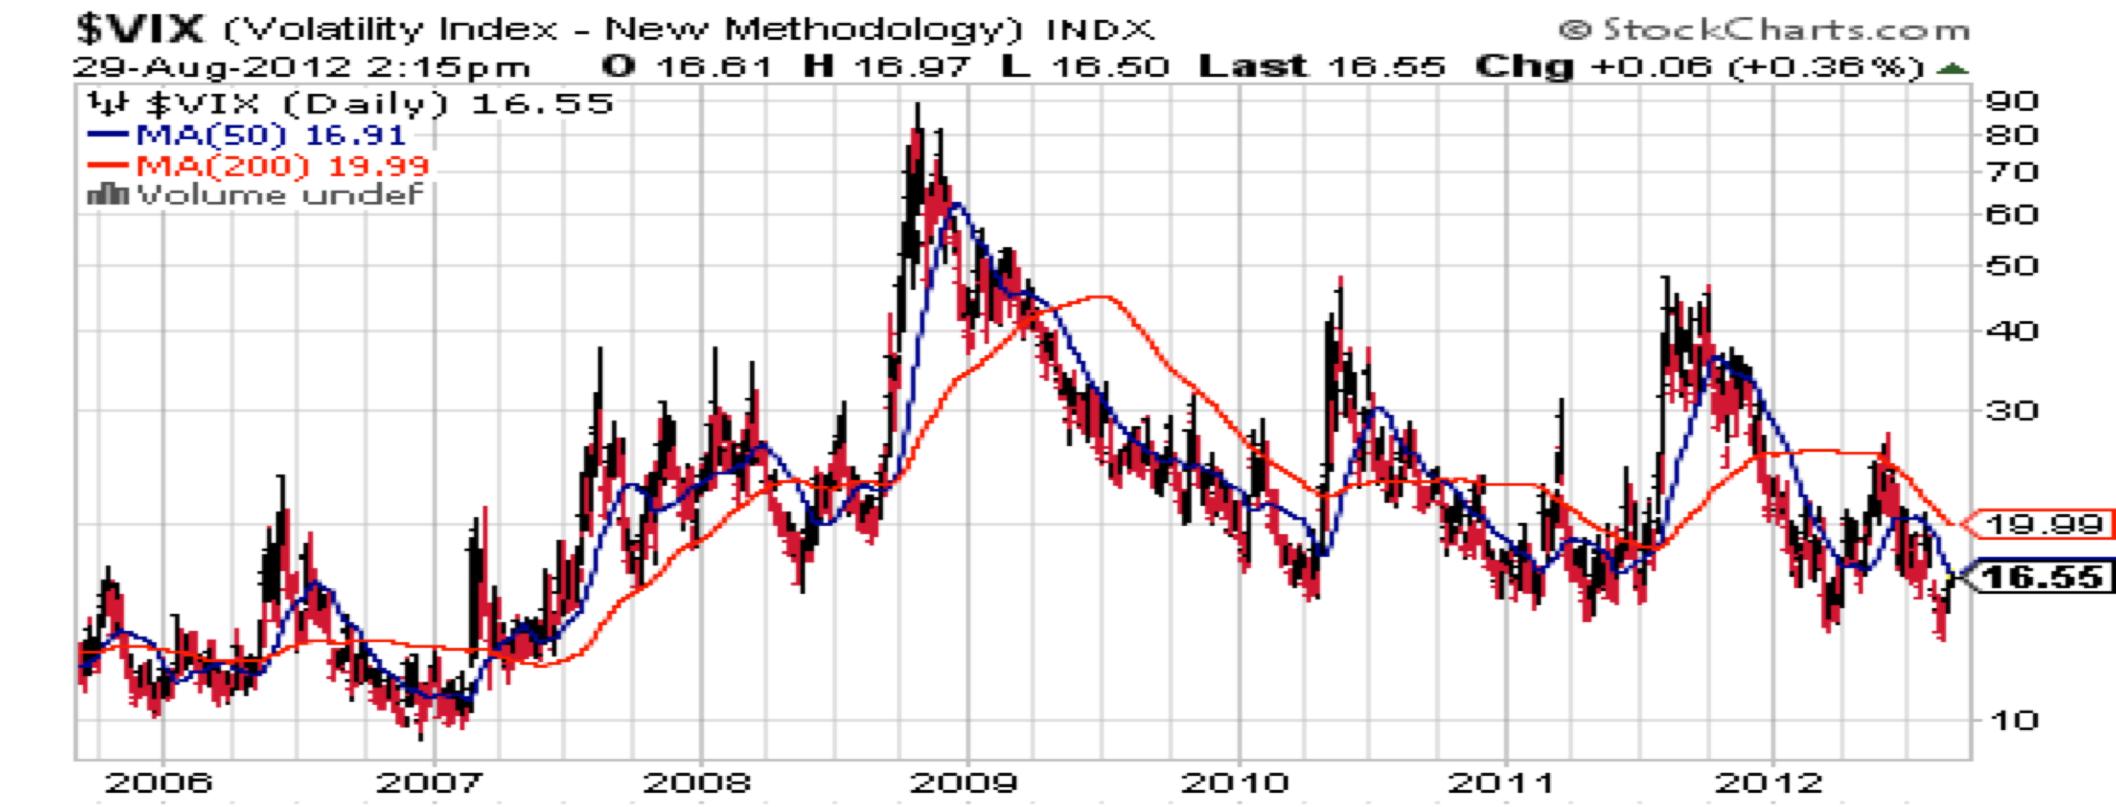 VIX, Volatility Index